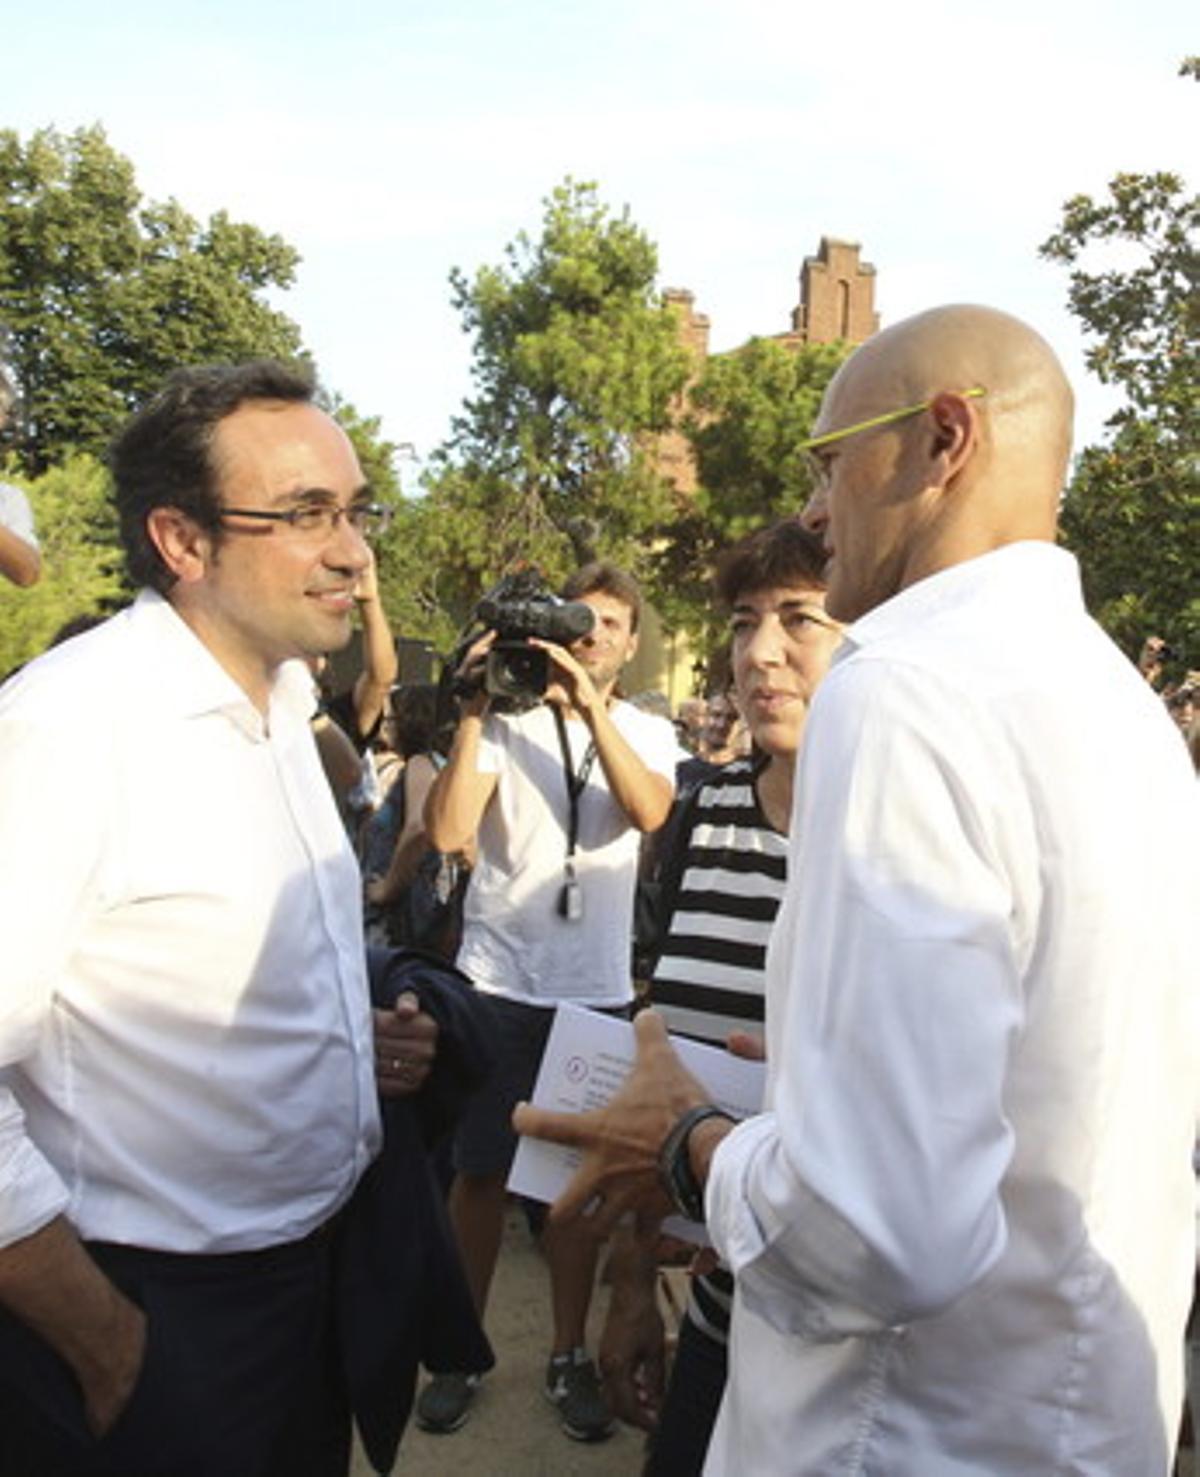 Josep Rull (izquierda) habla con el cabeza de lista de Junts pel sí, Raül ROmeva, el 5 de agosto.